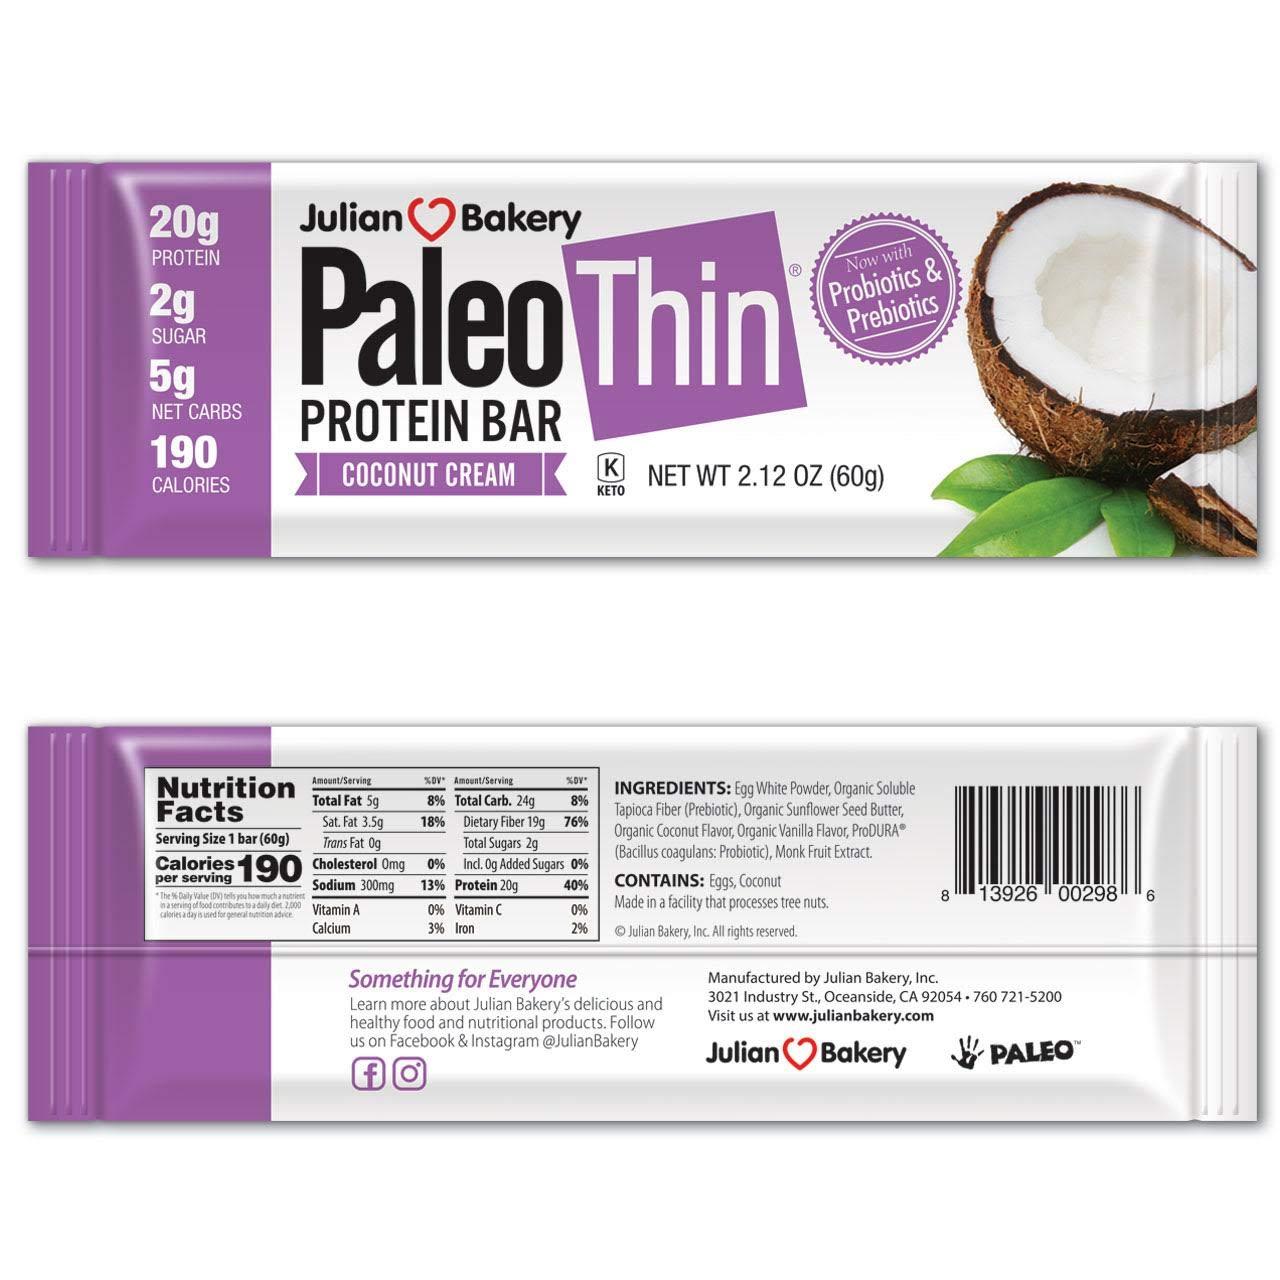 Paleo Protein Bar (Coconut Cream) 12 Bars (20g Egg White Protein) 5 Net Carbs (Organic Prebiotics / Probiotics) by Julian Bakery